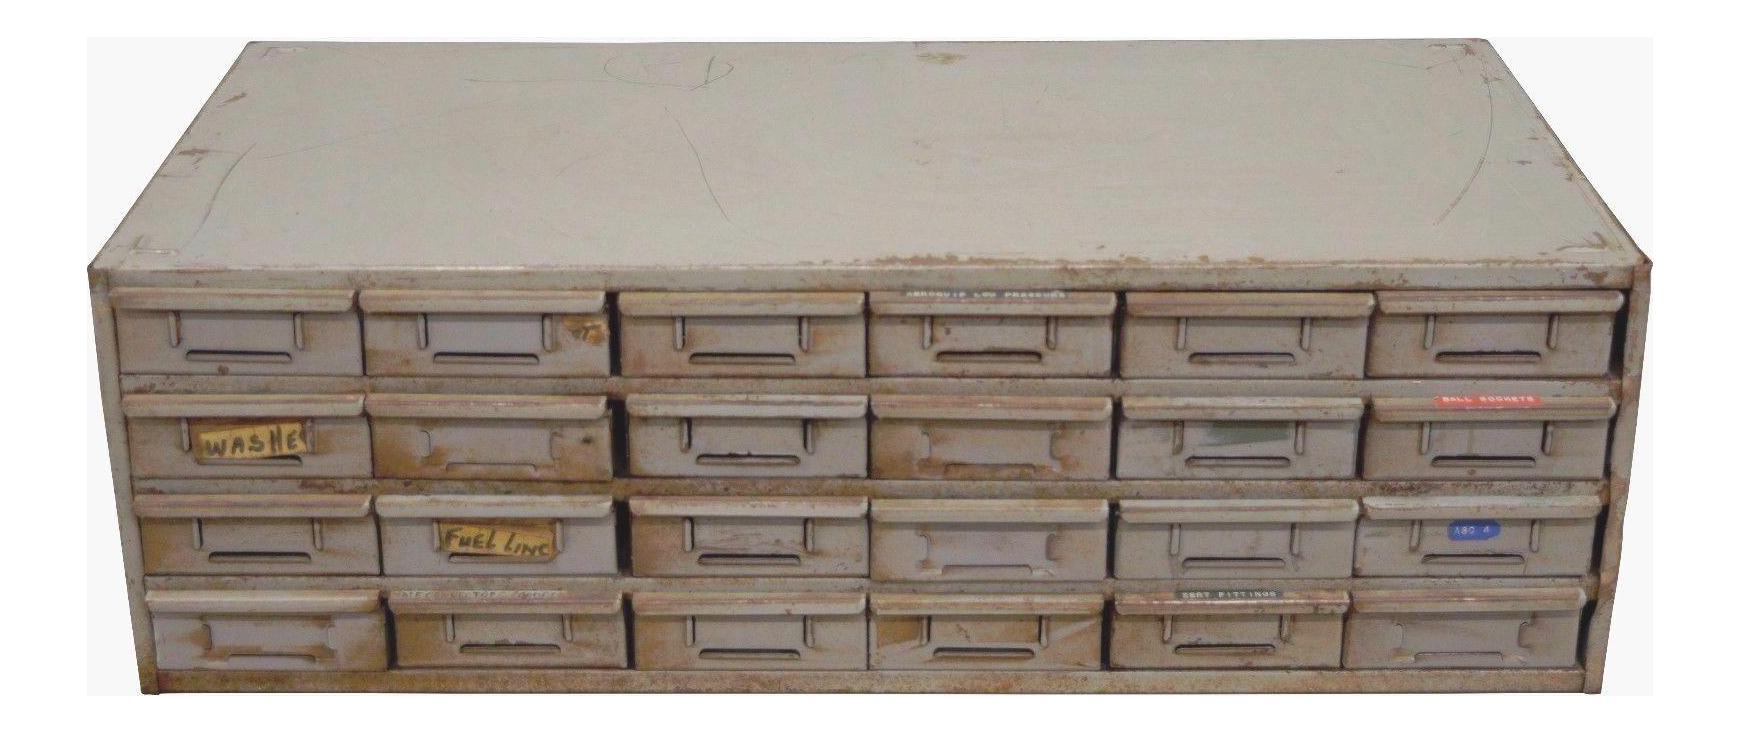 Vintage 24 Drawer Steel Metal Storage Tool Parts Cabinet Organizer Industrial Lyon B  sc 1 st  Chairish & Vintage 24 Drawer Steel Metal Storage Tool Parts Cabinet Organizer ...